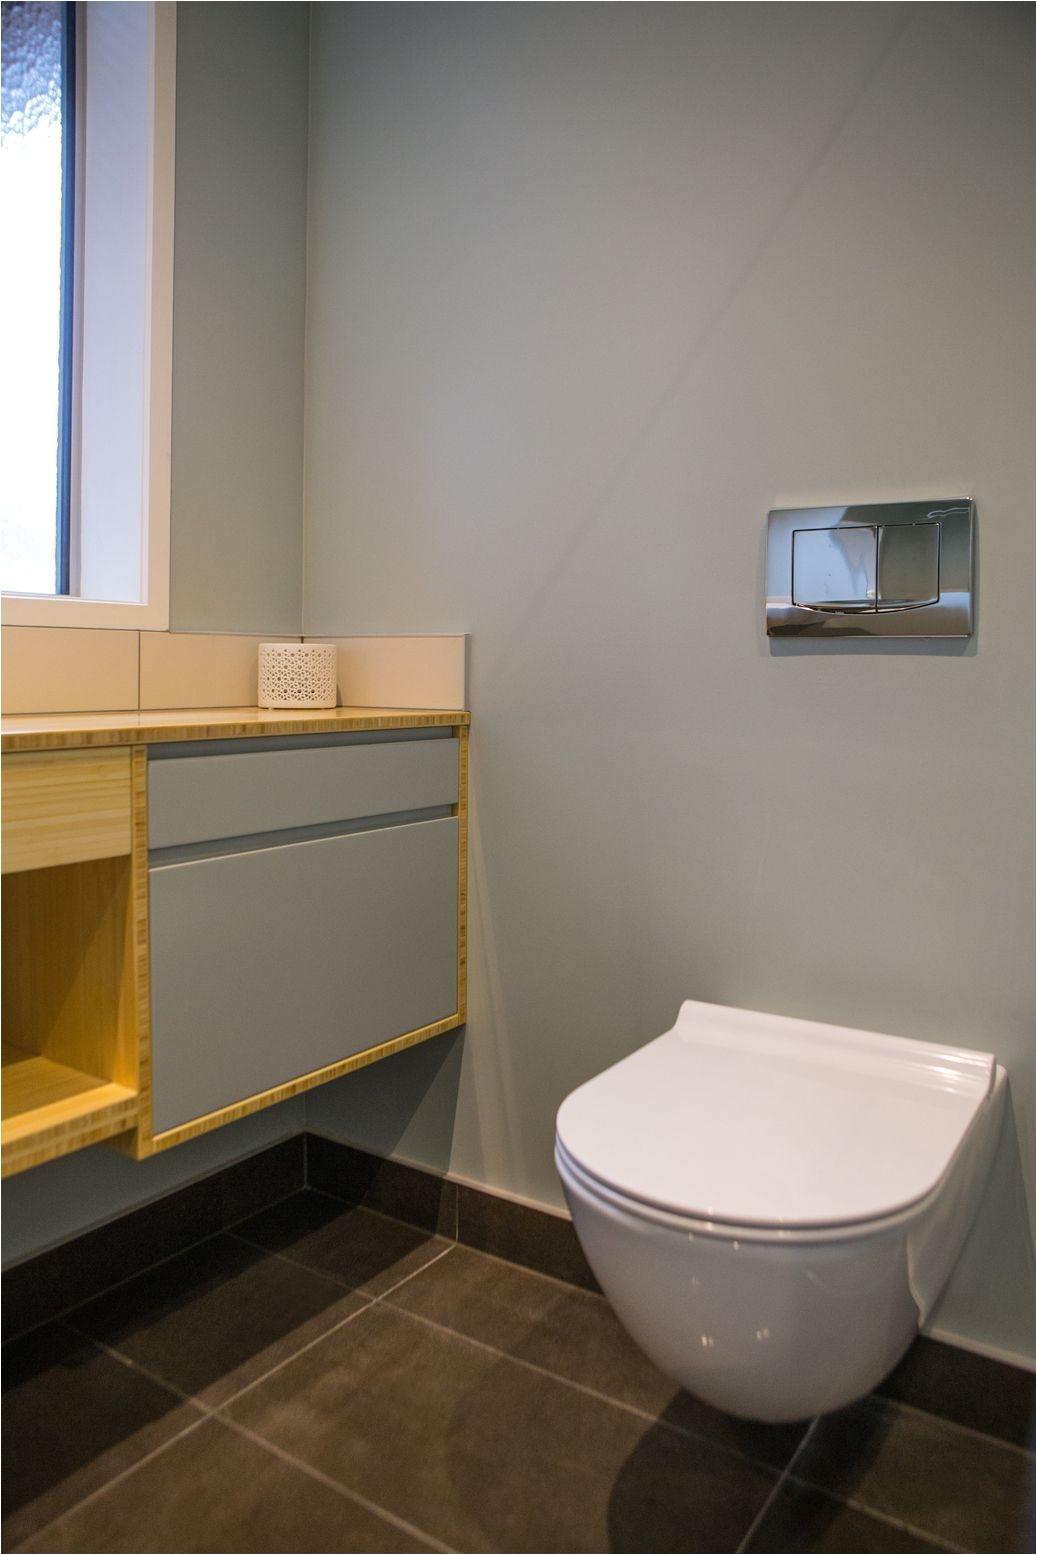 Bathroom 627 Sally Steer Design Ltd Wellington NZ bathroomdesignwellington bathroomdesignnz